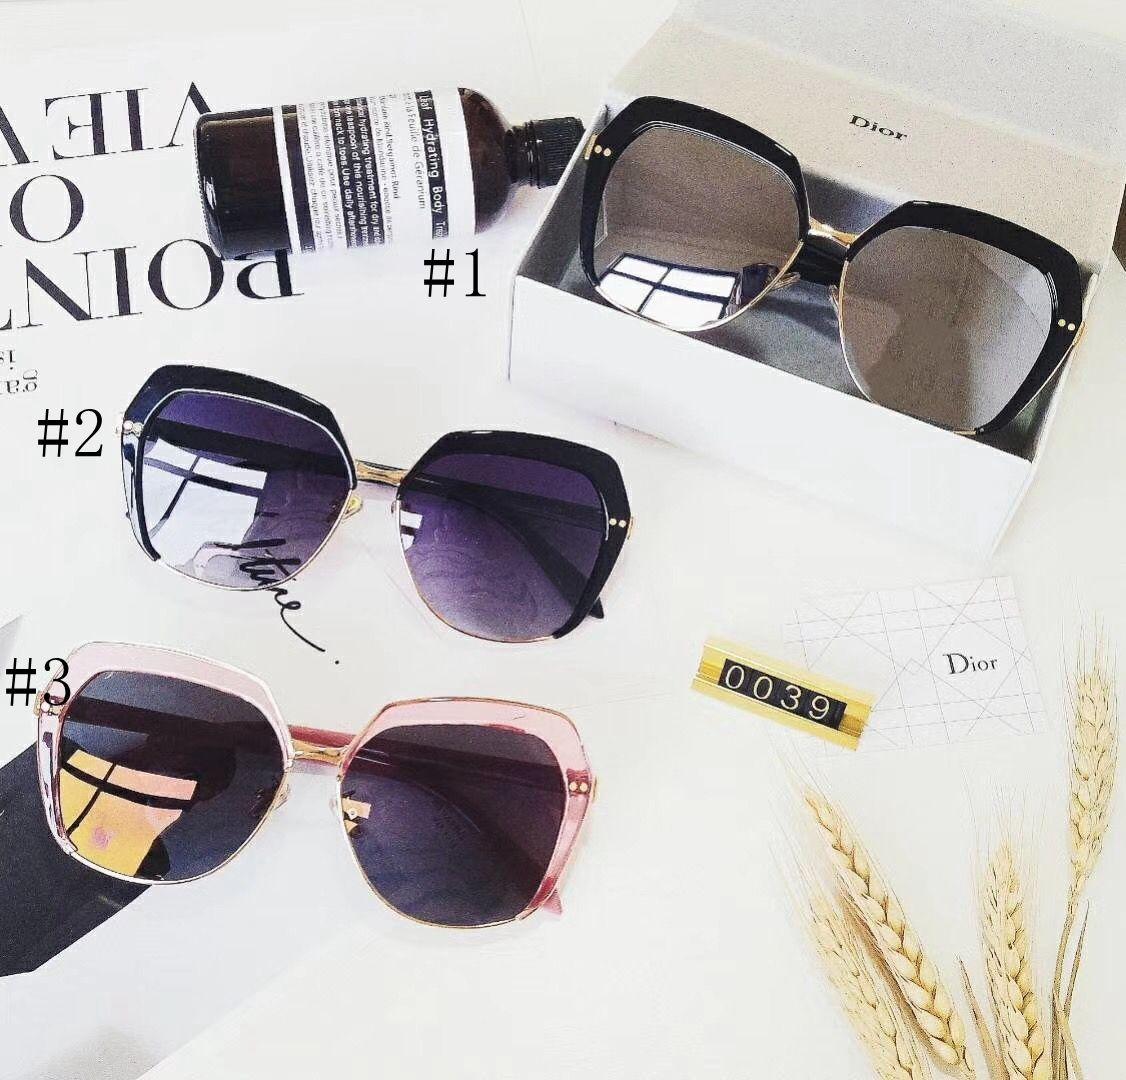 Compre Hot Vintage Óculos De Sol Das Mulheres Designer De Marca Famosa  Marca De Luxo Das Mulheres Óculos De Sol Das Senhoras Óculos De Sol Com  Casos E Caixa ... c22f0e292f